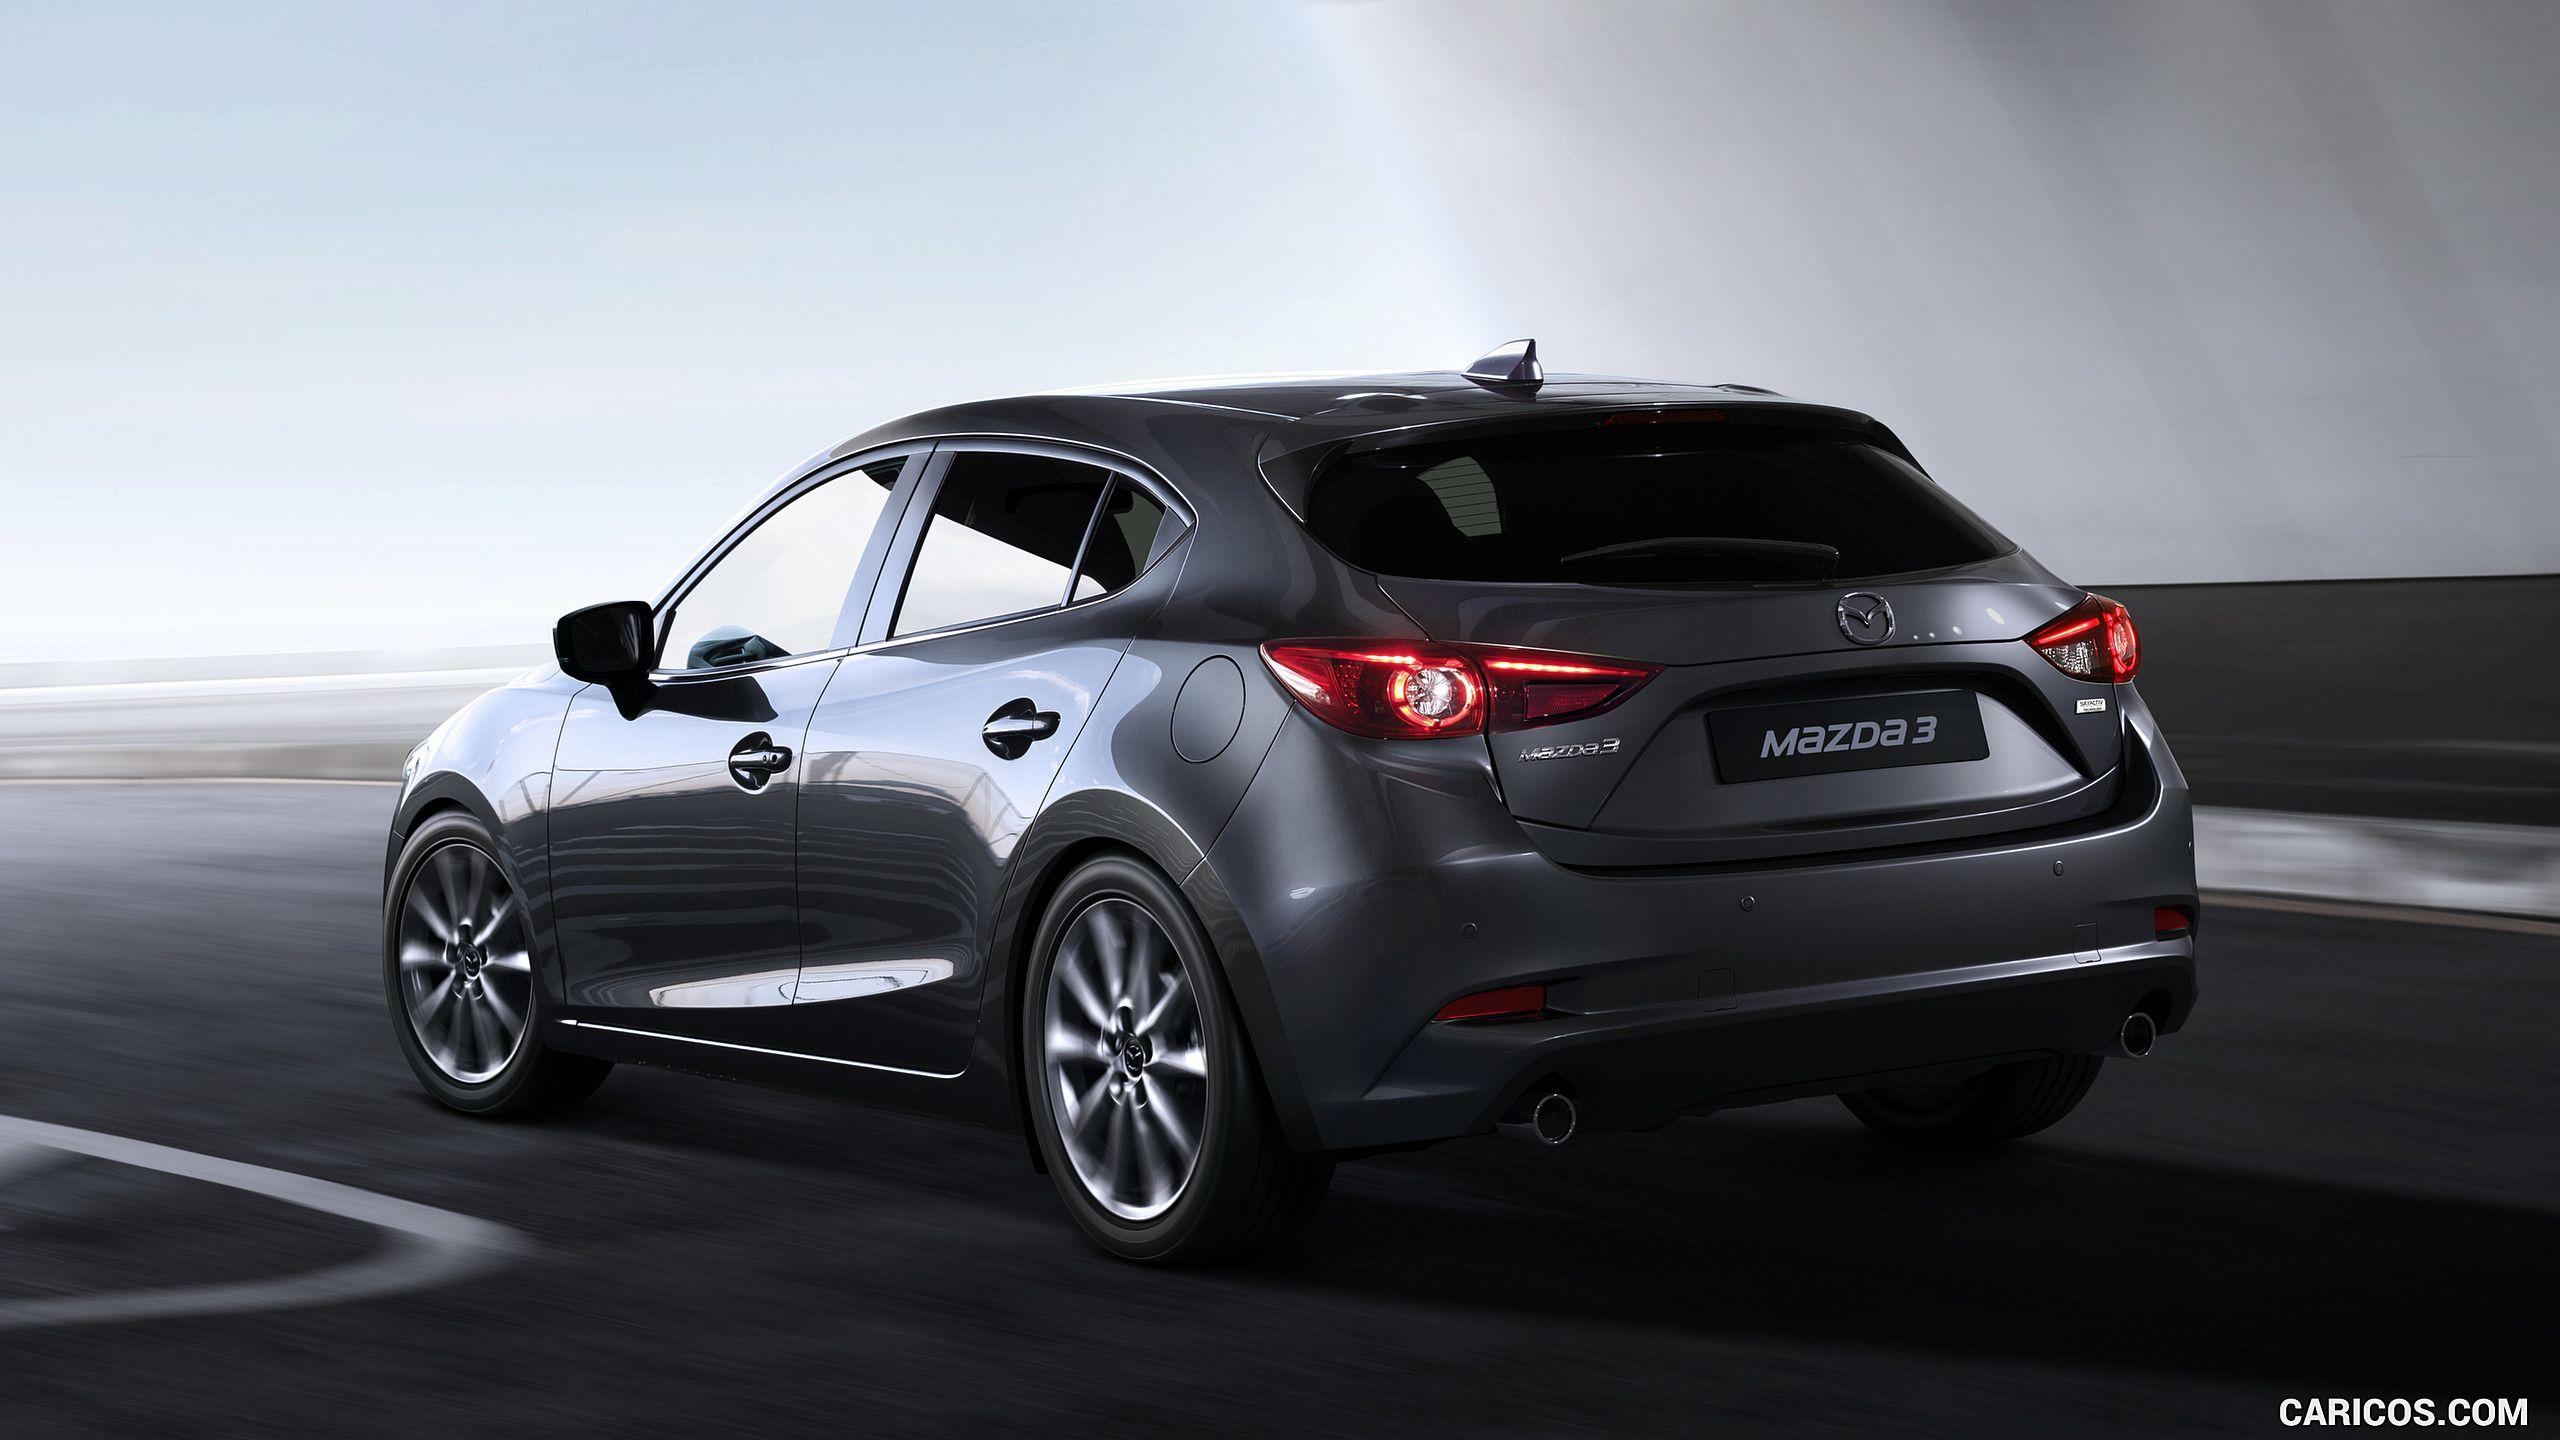 2017 Mazda 3 5 Door Hatchback Color Machine Grey Rear Three Quarter Hd